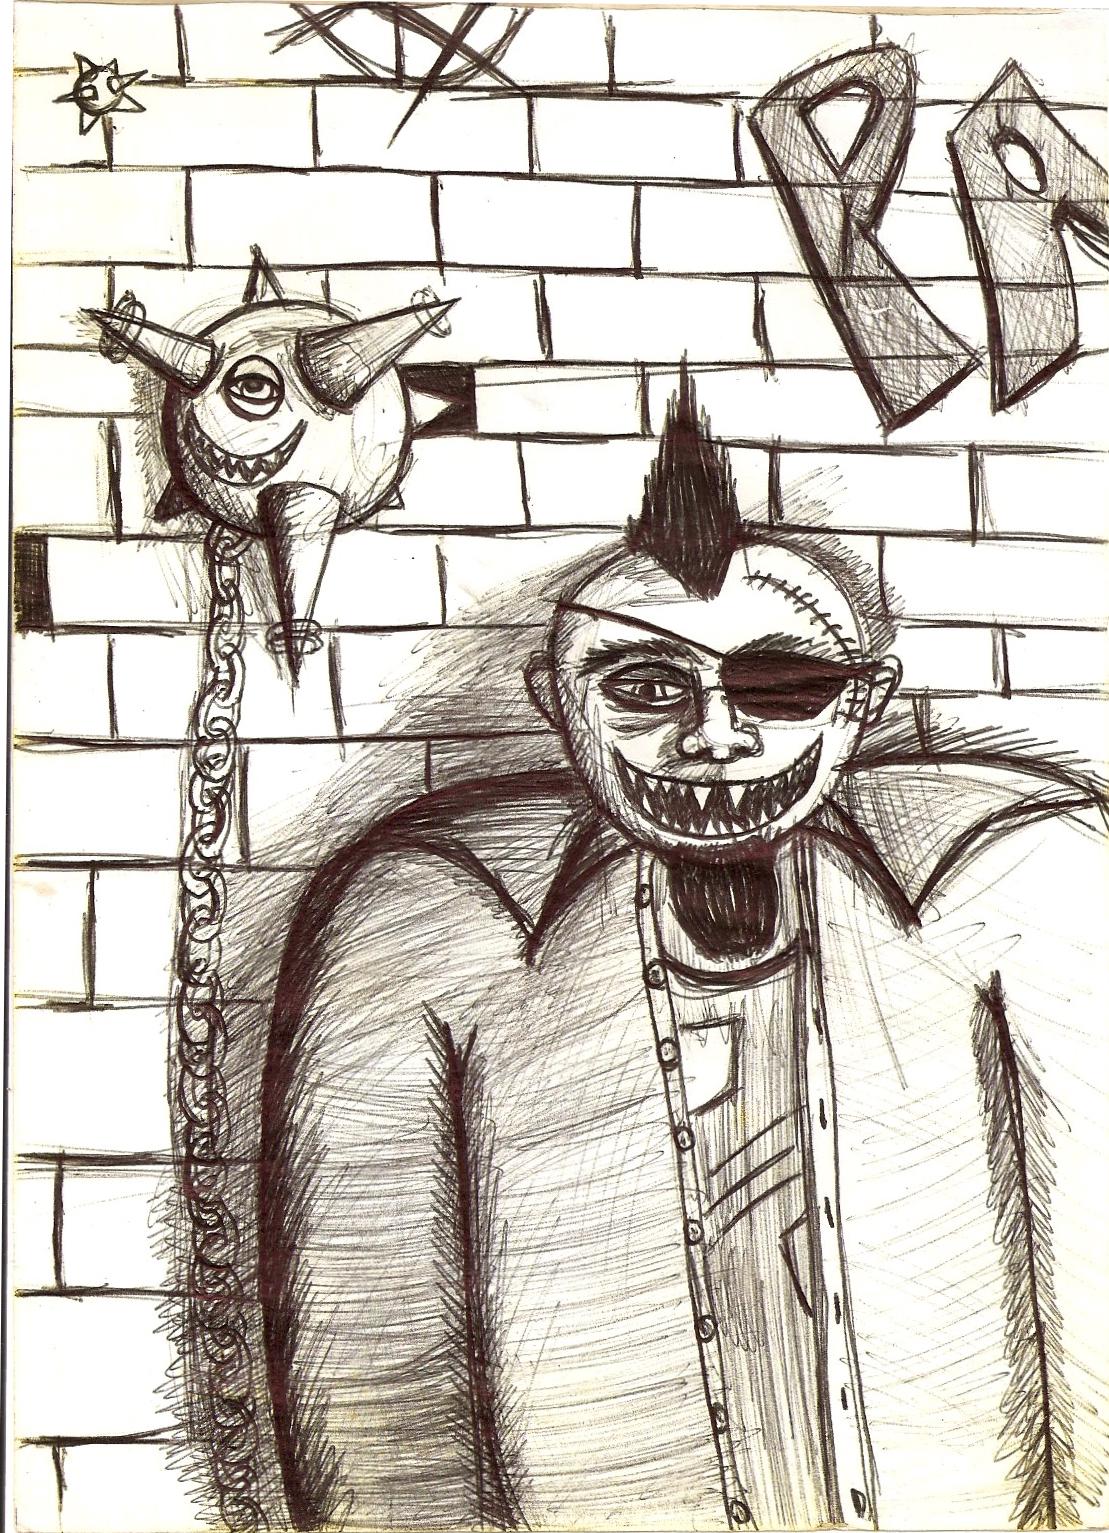 Guy with Spikey